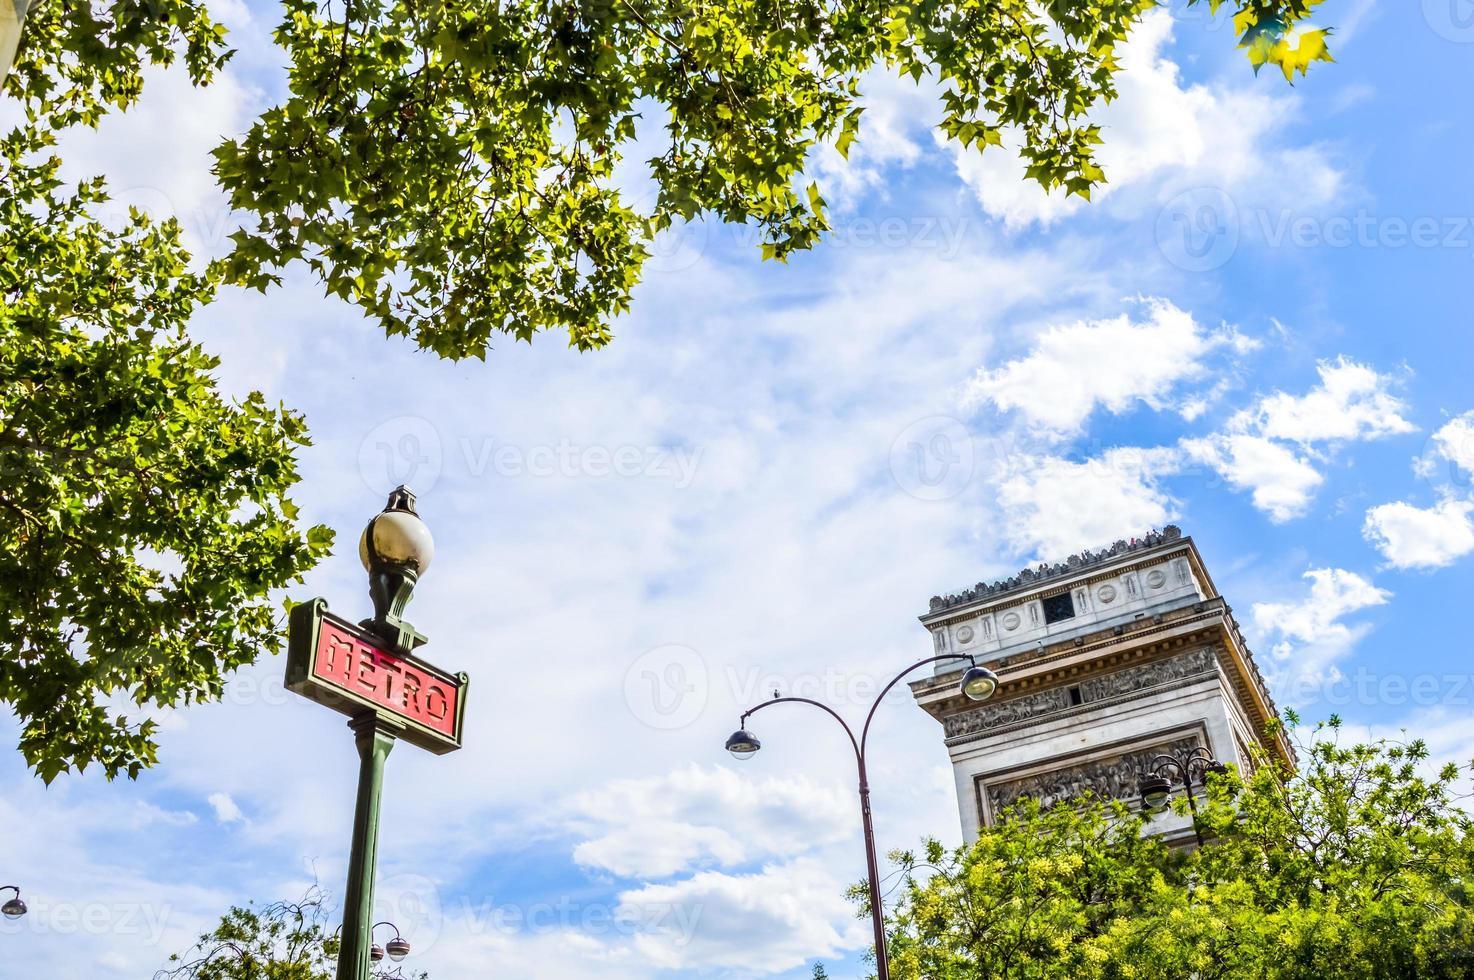 metro teken in Parijs in arc de triomphe monument foto